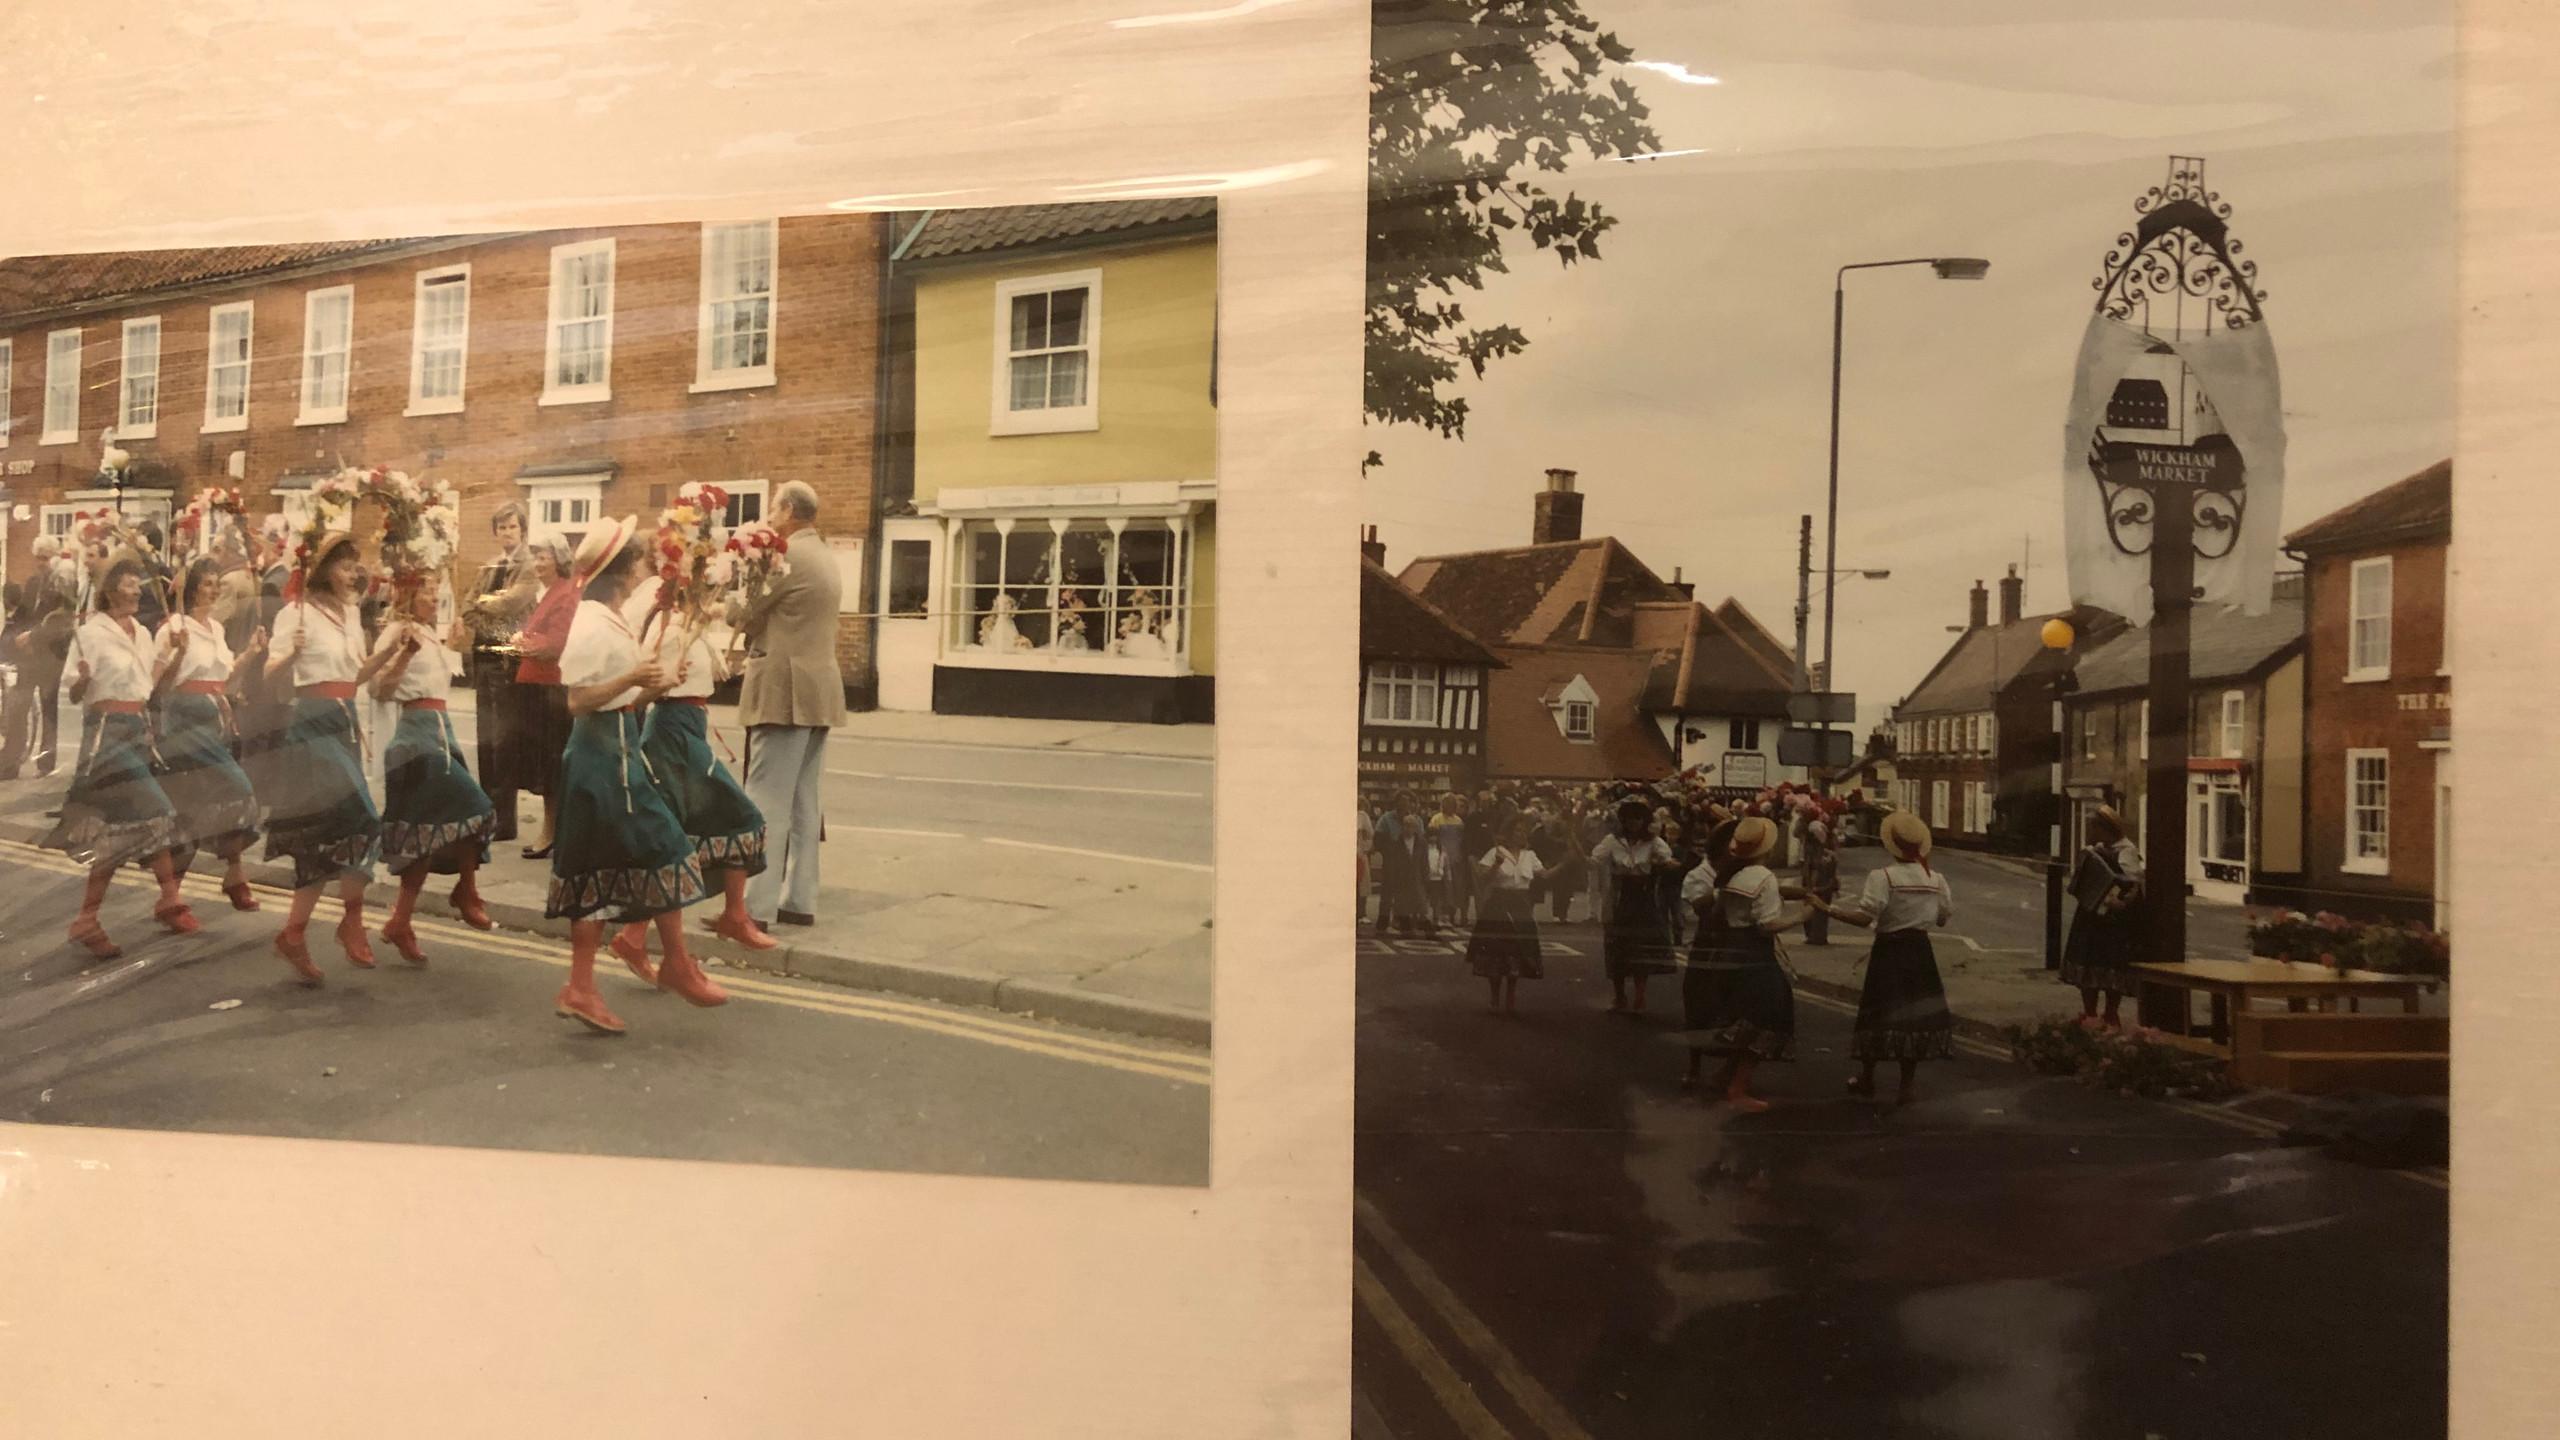 Wickham 1989